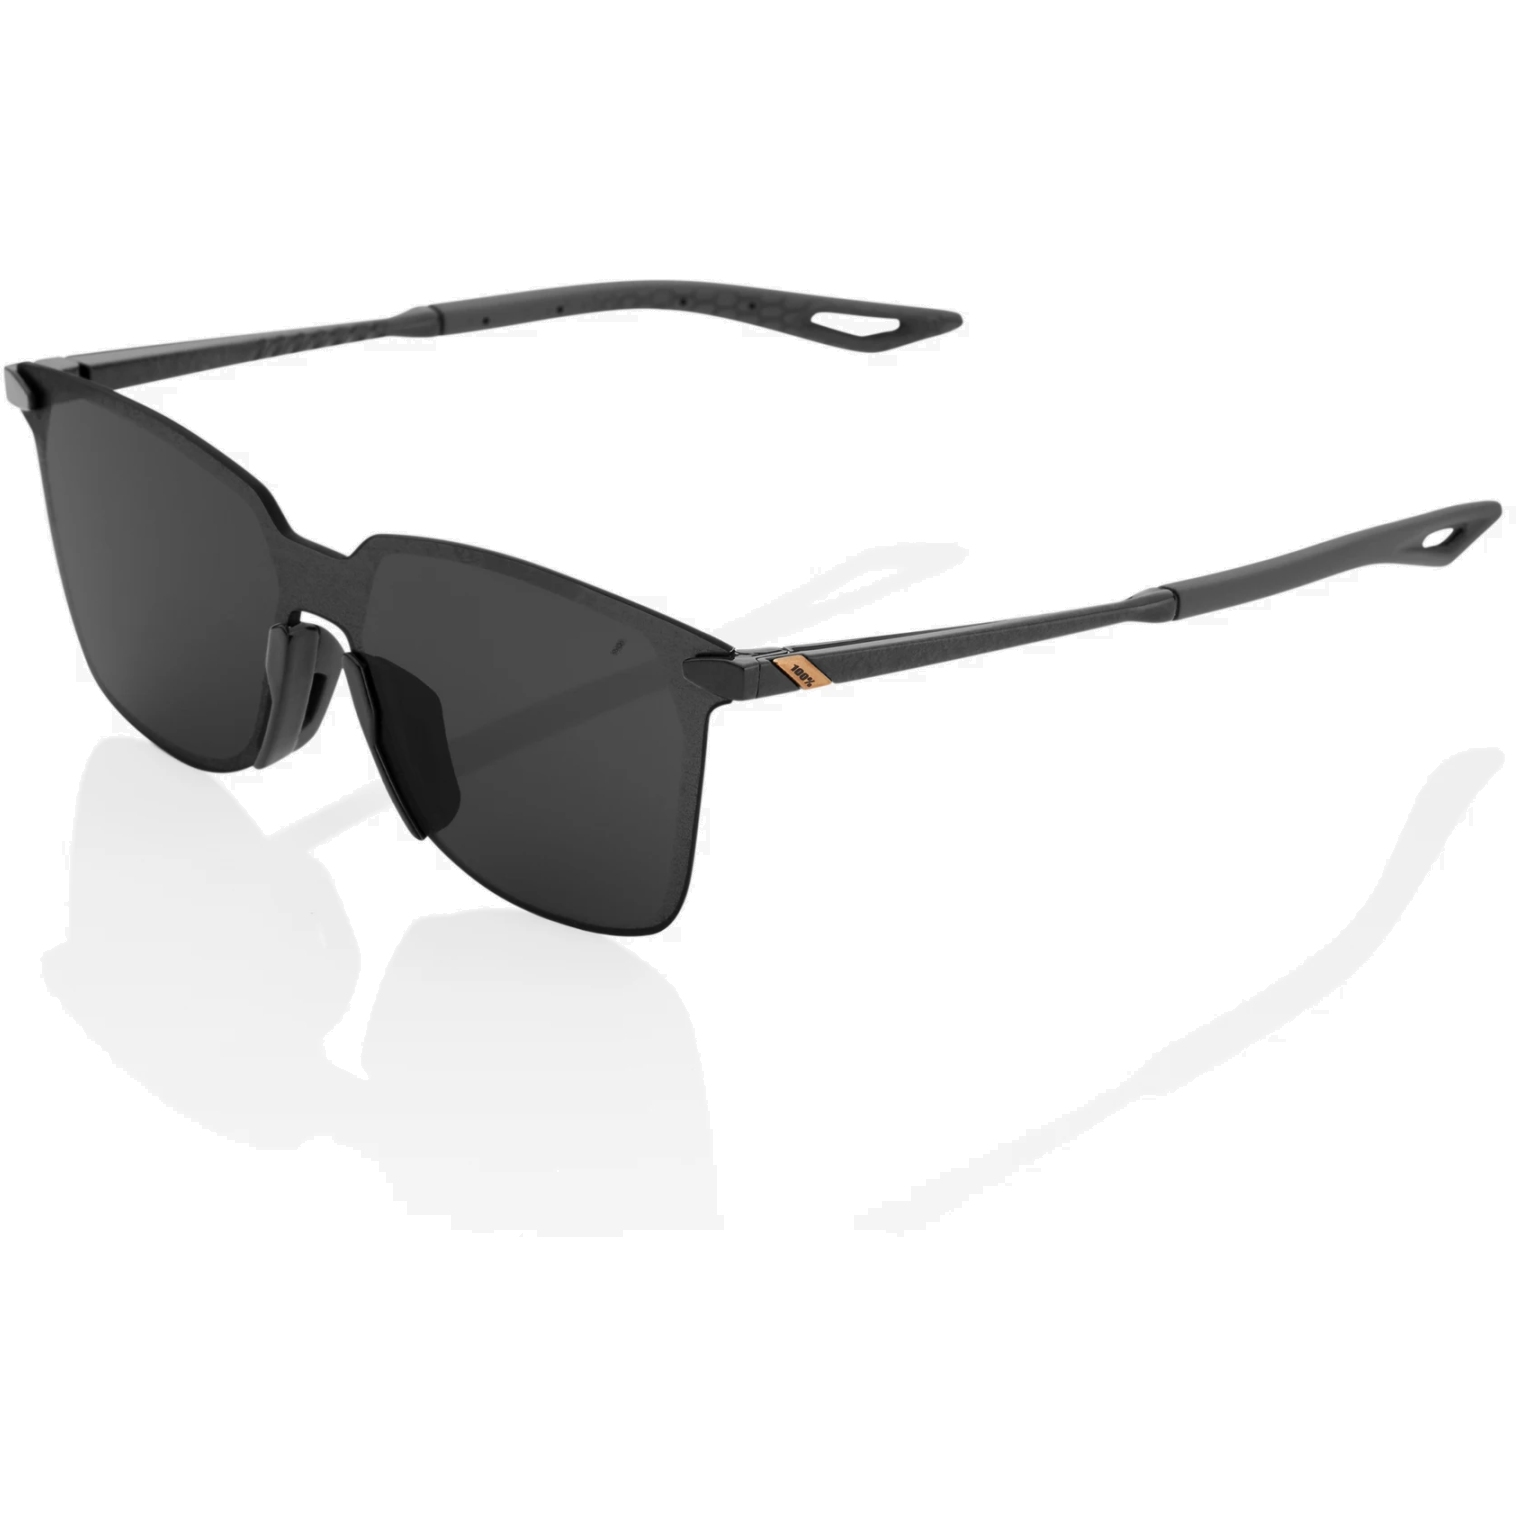 Imagen de 100% Legere UltraCarbon square Gafas - Smoke Lens - Polished Black